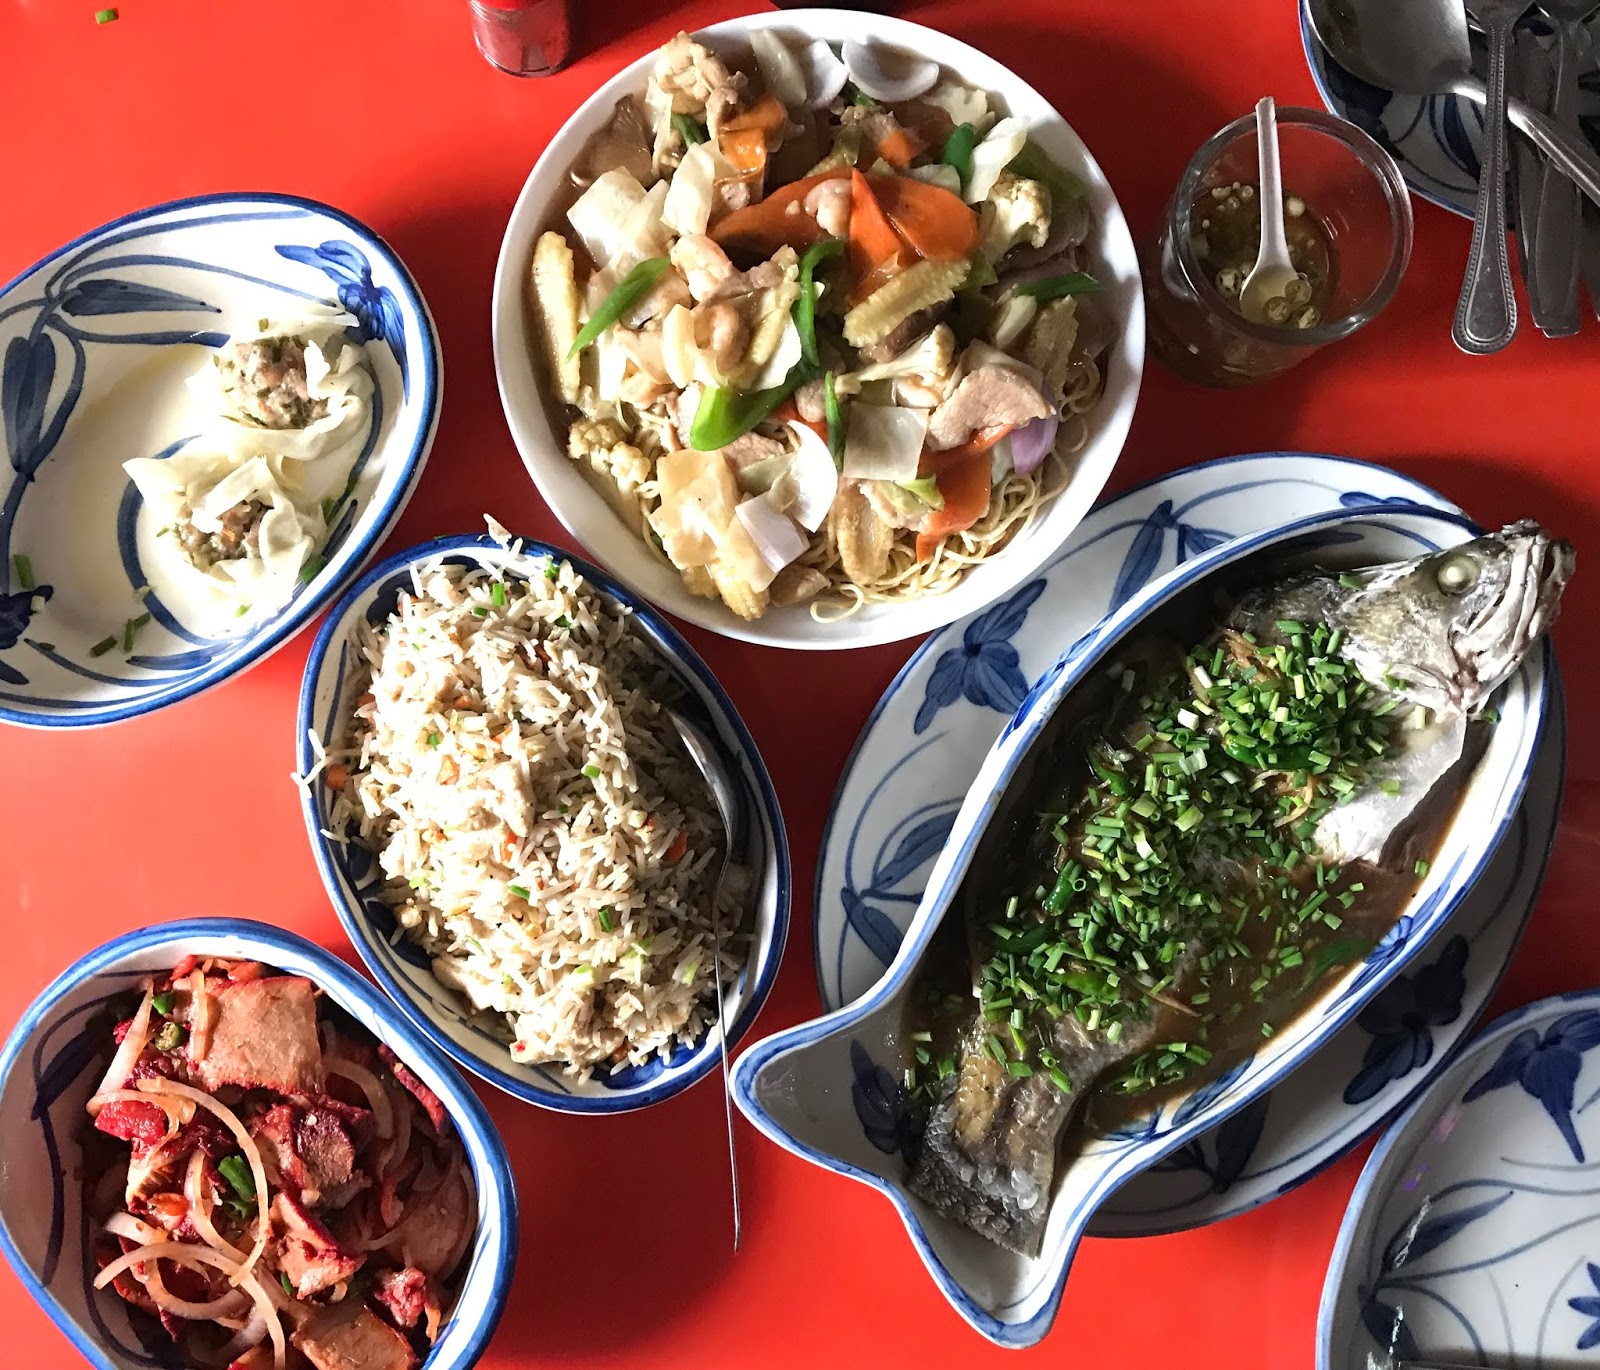 Chinnesse Food: There's No Chinese Food Like Kolkata Chinese? Eau Chew